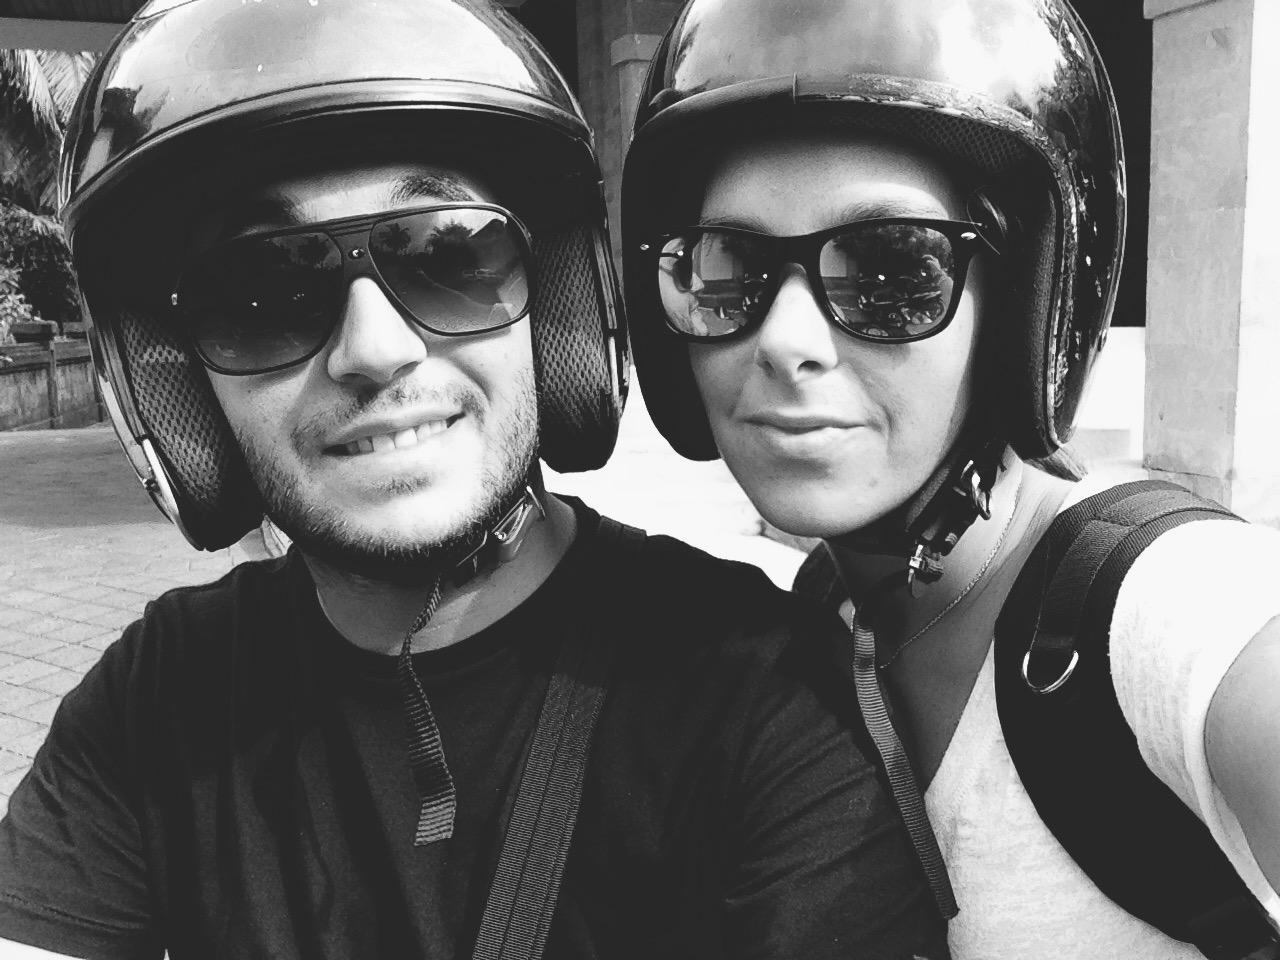 scooter-bali-alex-flo-onmyway.JPG